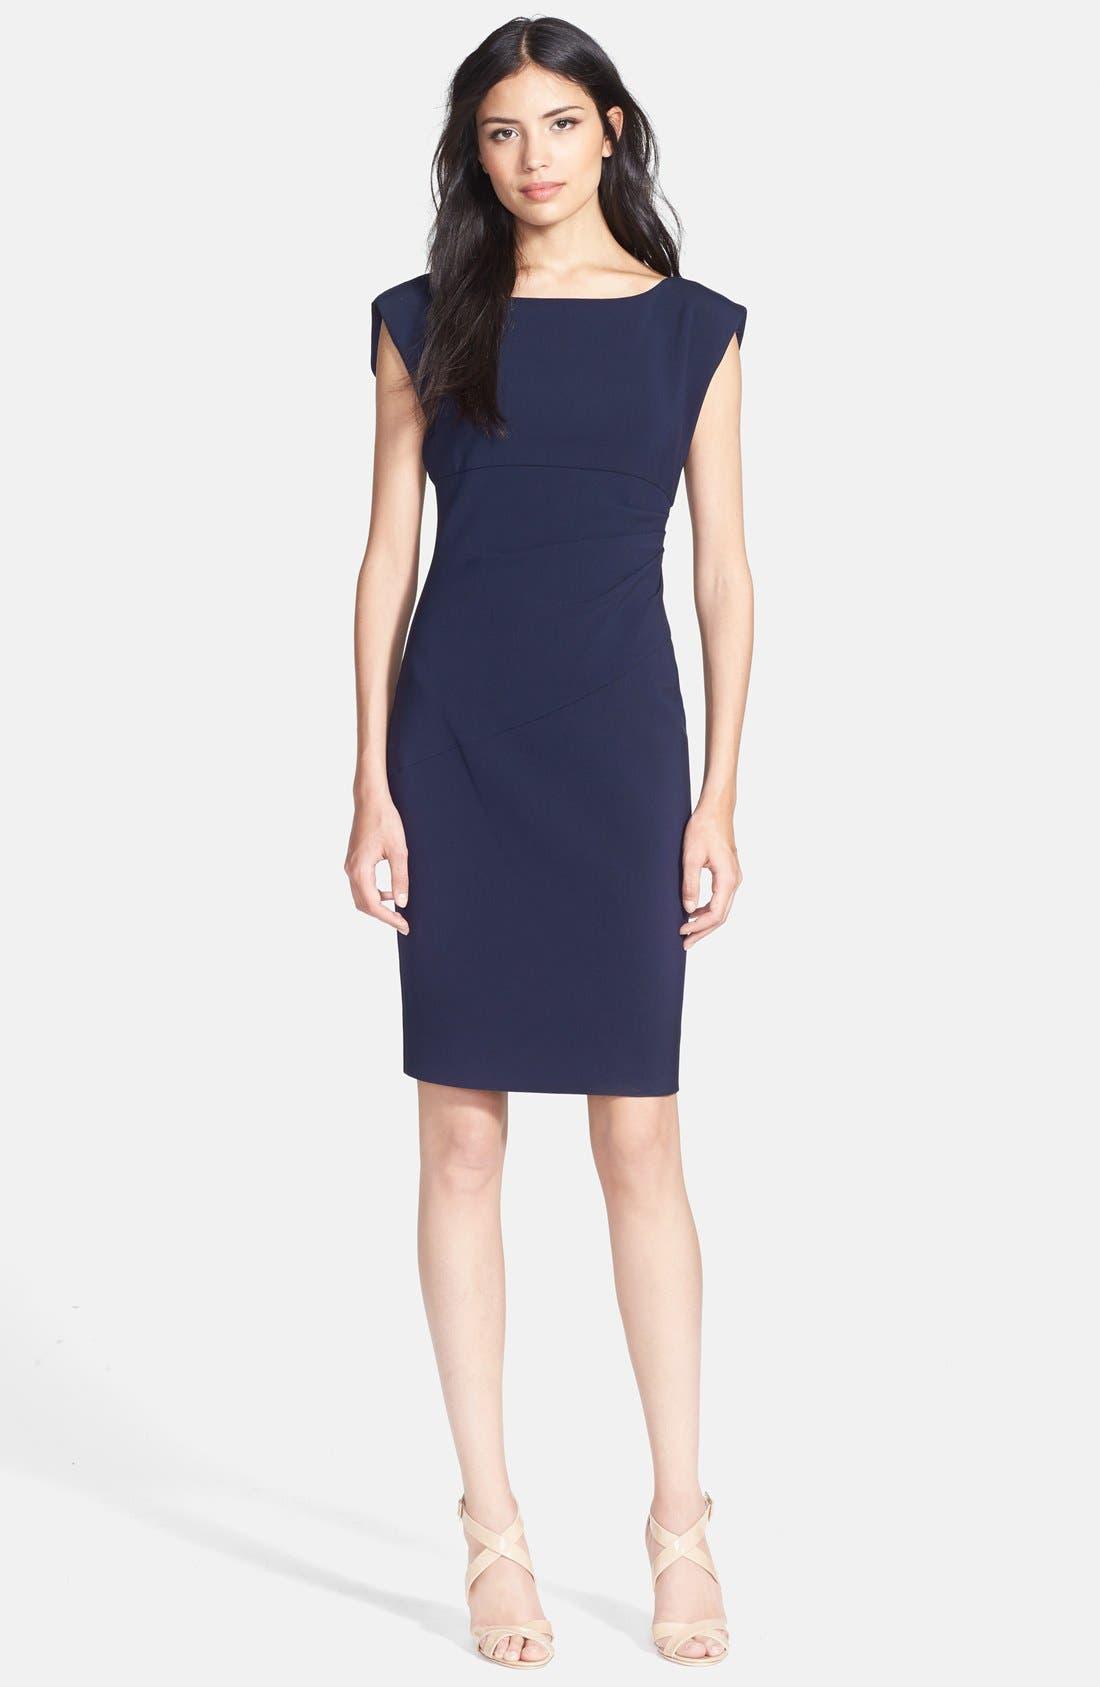 Alternate Image 1 Selected - Diane von Furstenberg 'Jori' Ruched Sheath Dress